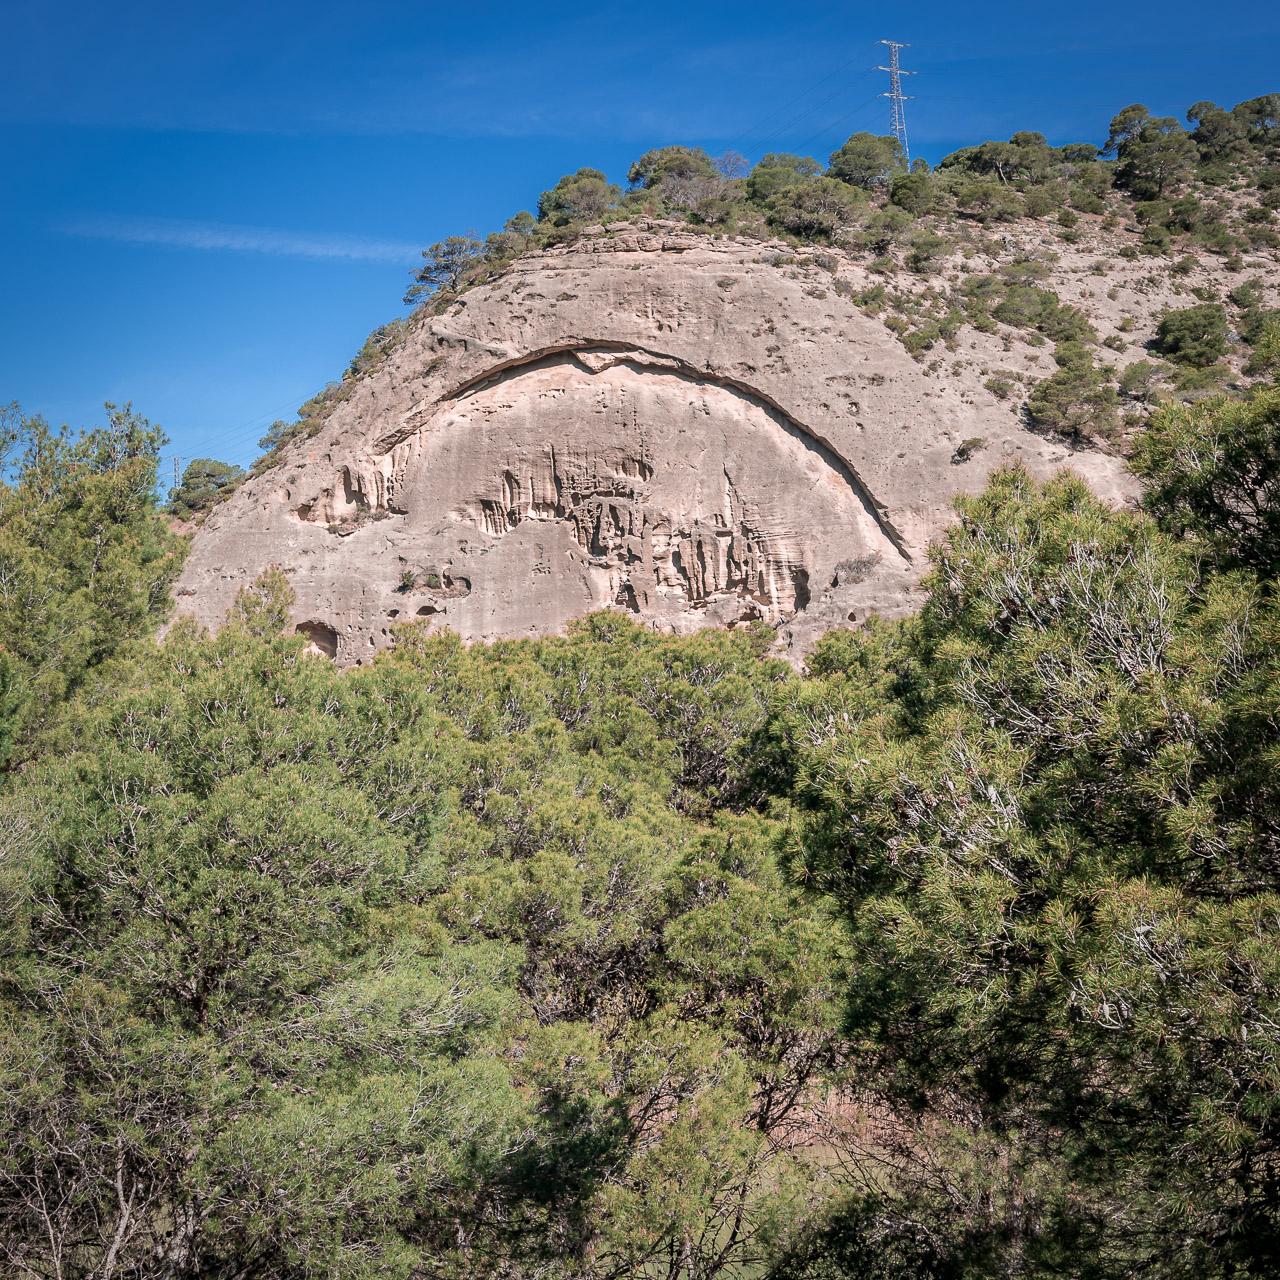 El Chorro National Park